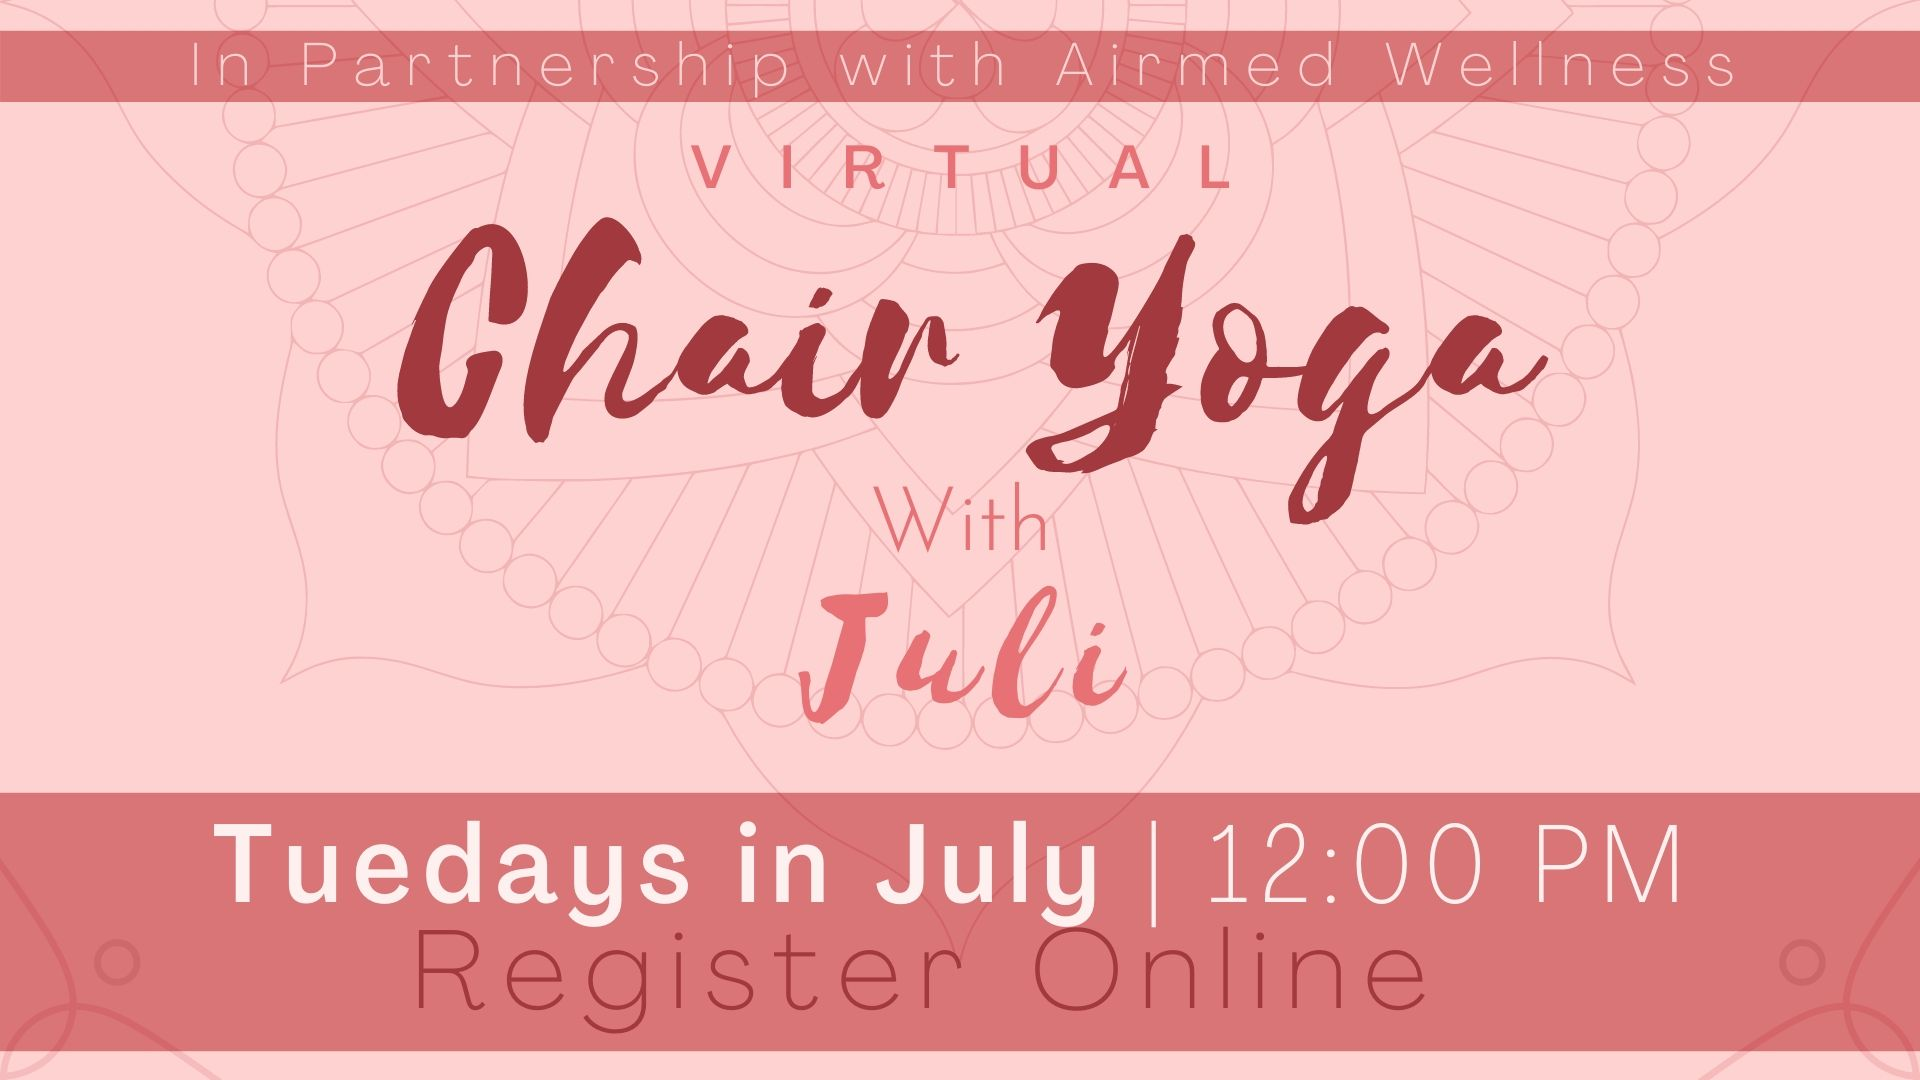 Chair Yoga with Juli (Virtual Program)